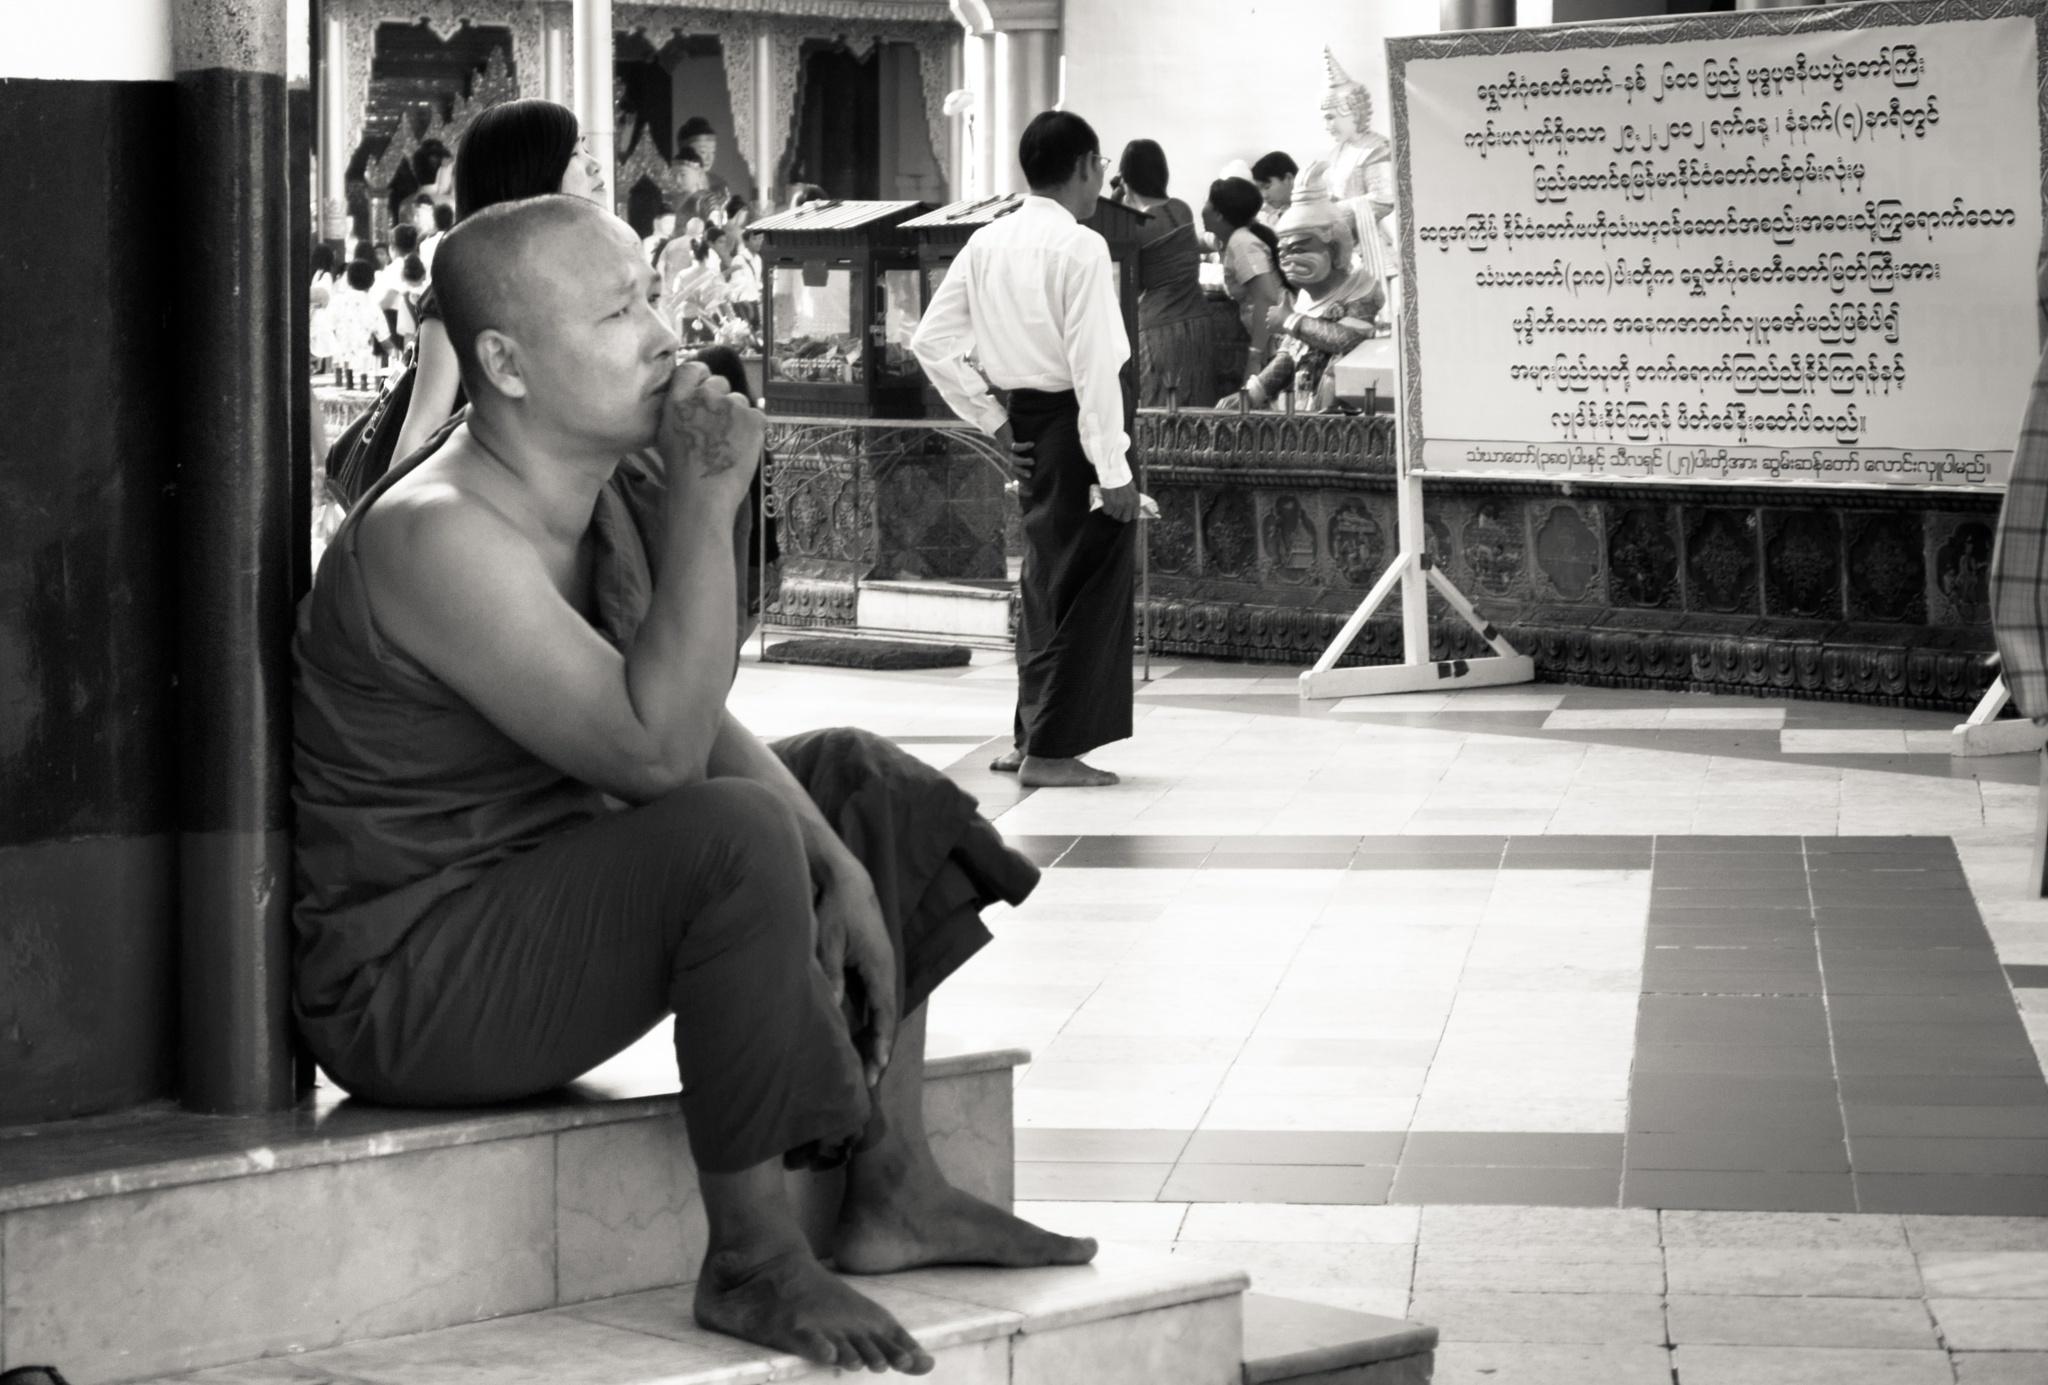 Monk by Sasha